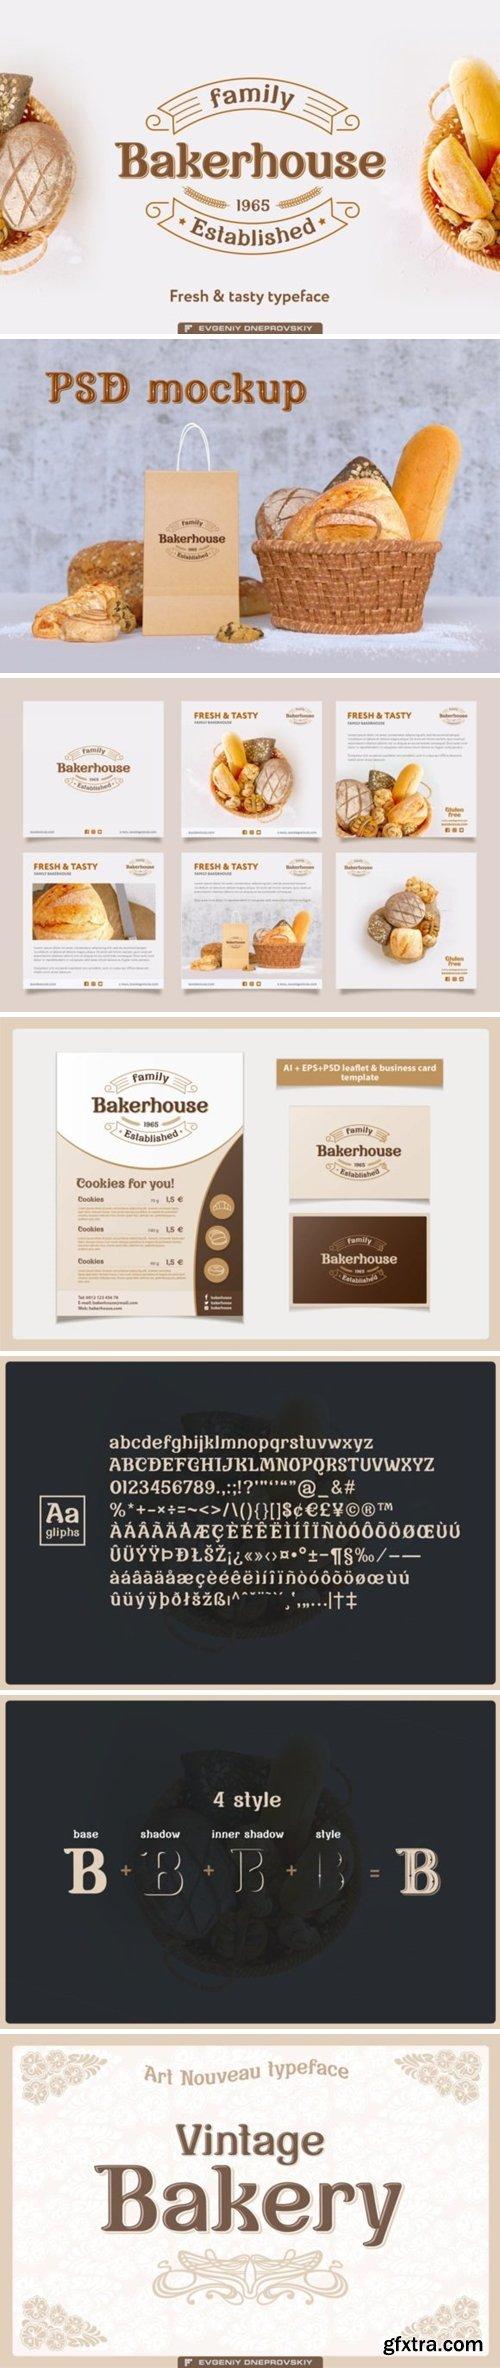 Bakerhouse Font